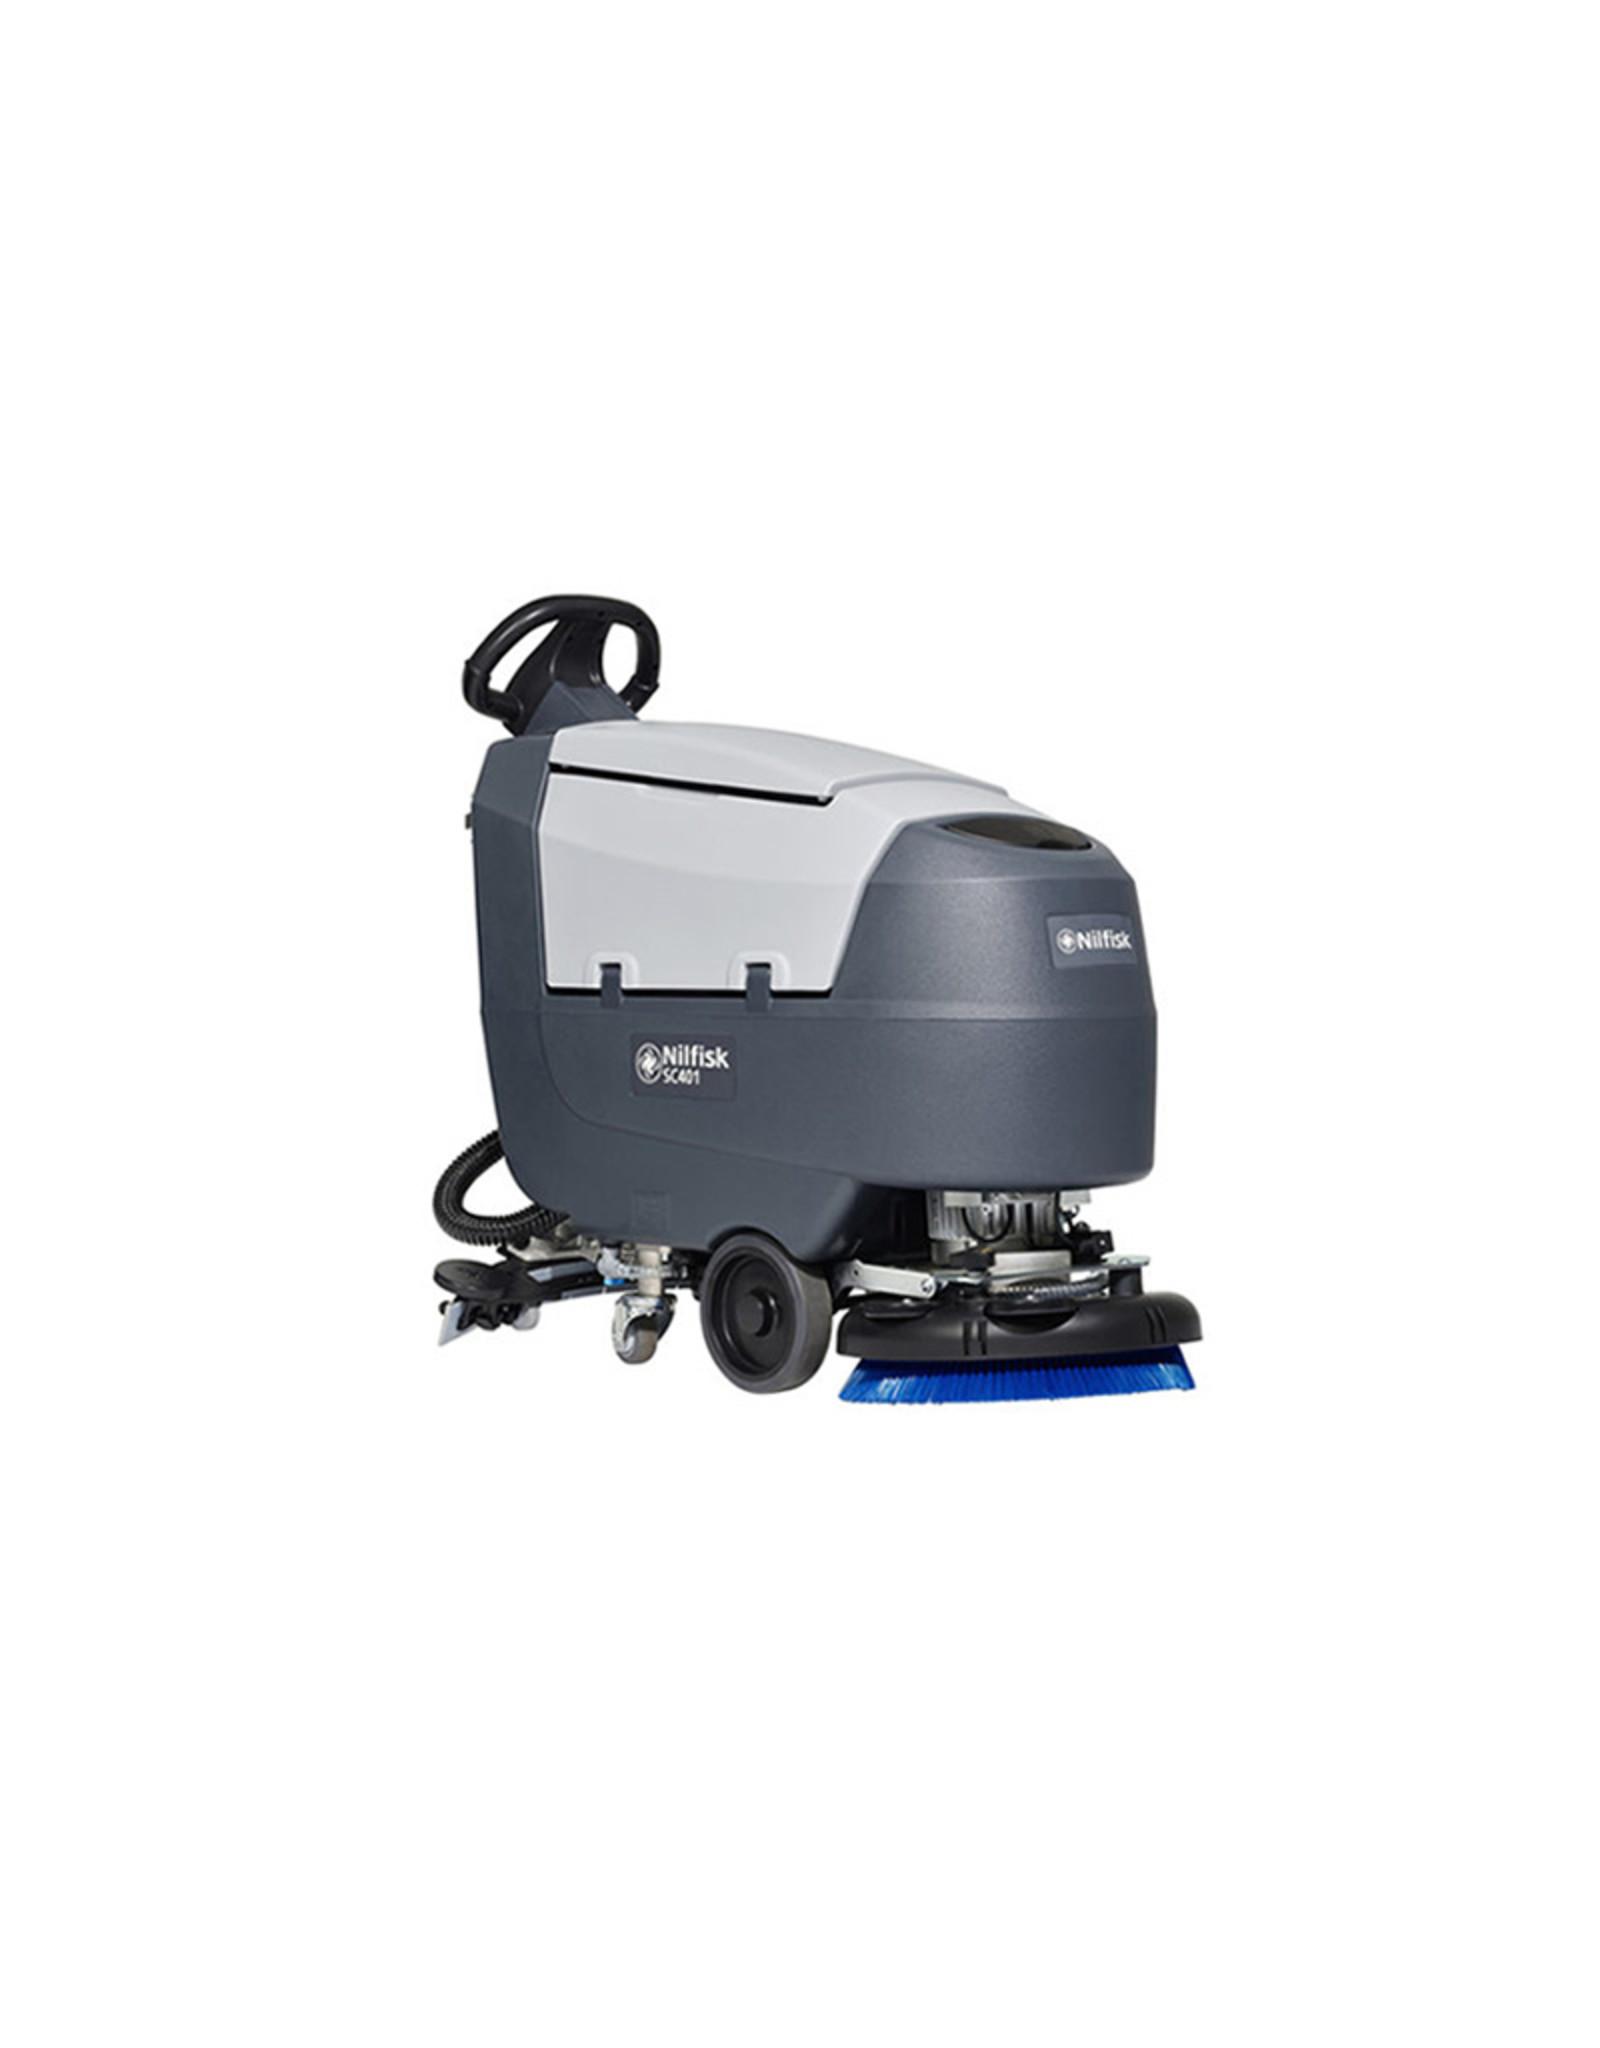 Nilfisk Nilfisk schrobzuigmachine Scrubber SC401 43 B Full PKG